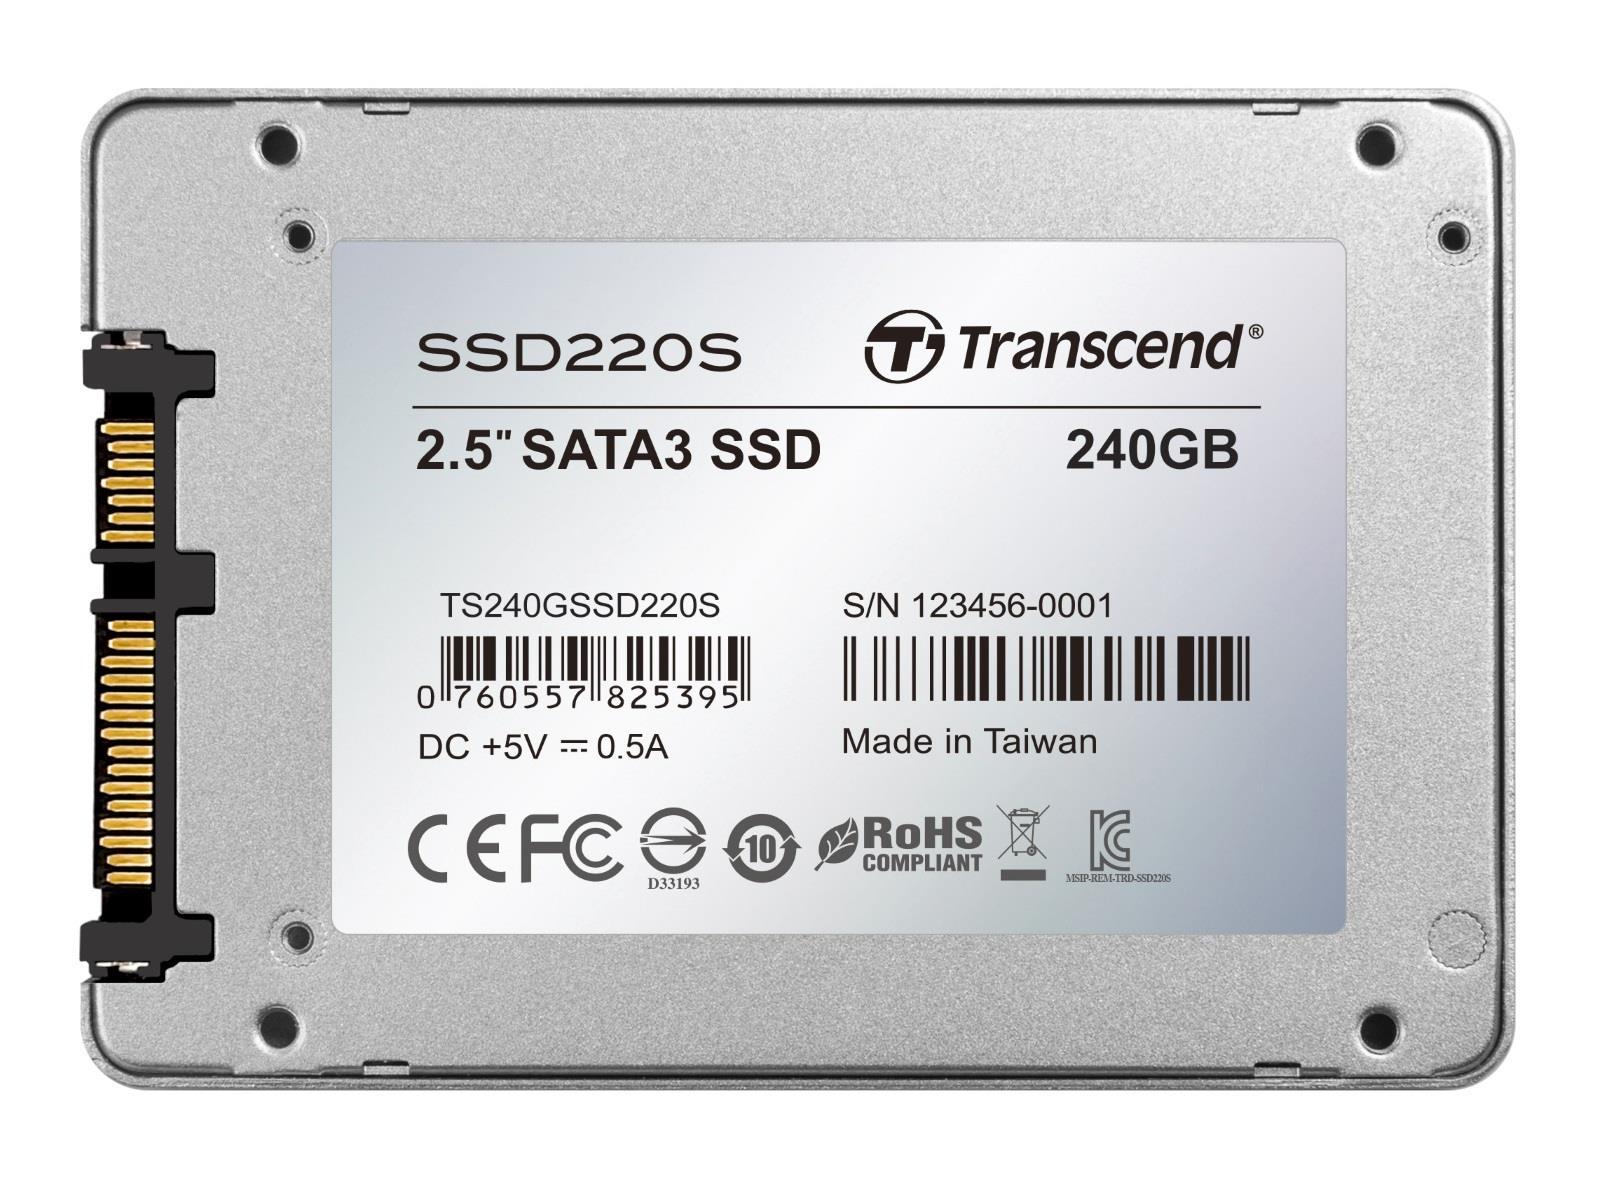 Transcend SSD220 (240GB) 2.5 inch Solid State Drive SATA III 6Gb/s Aluminium Casing (Silver)